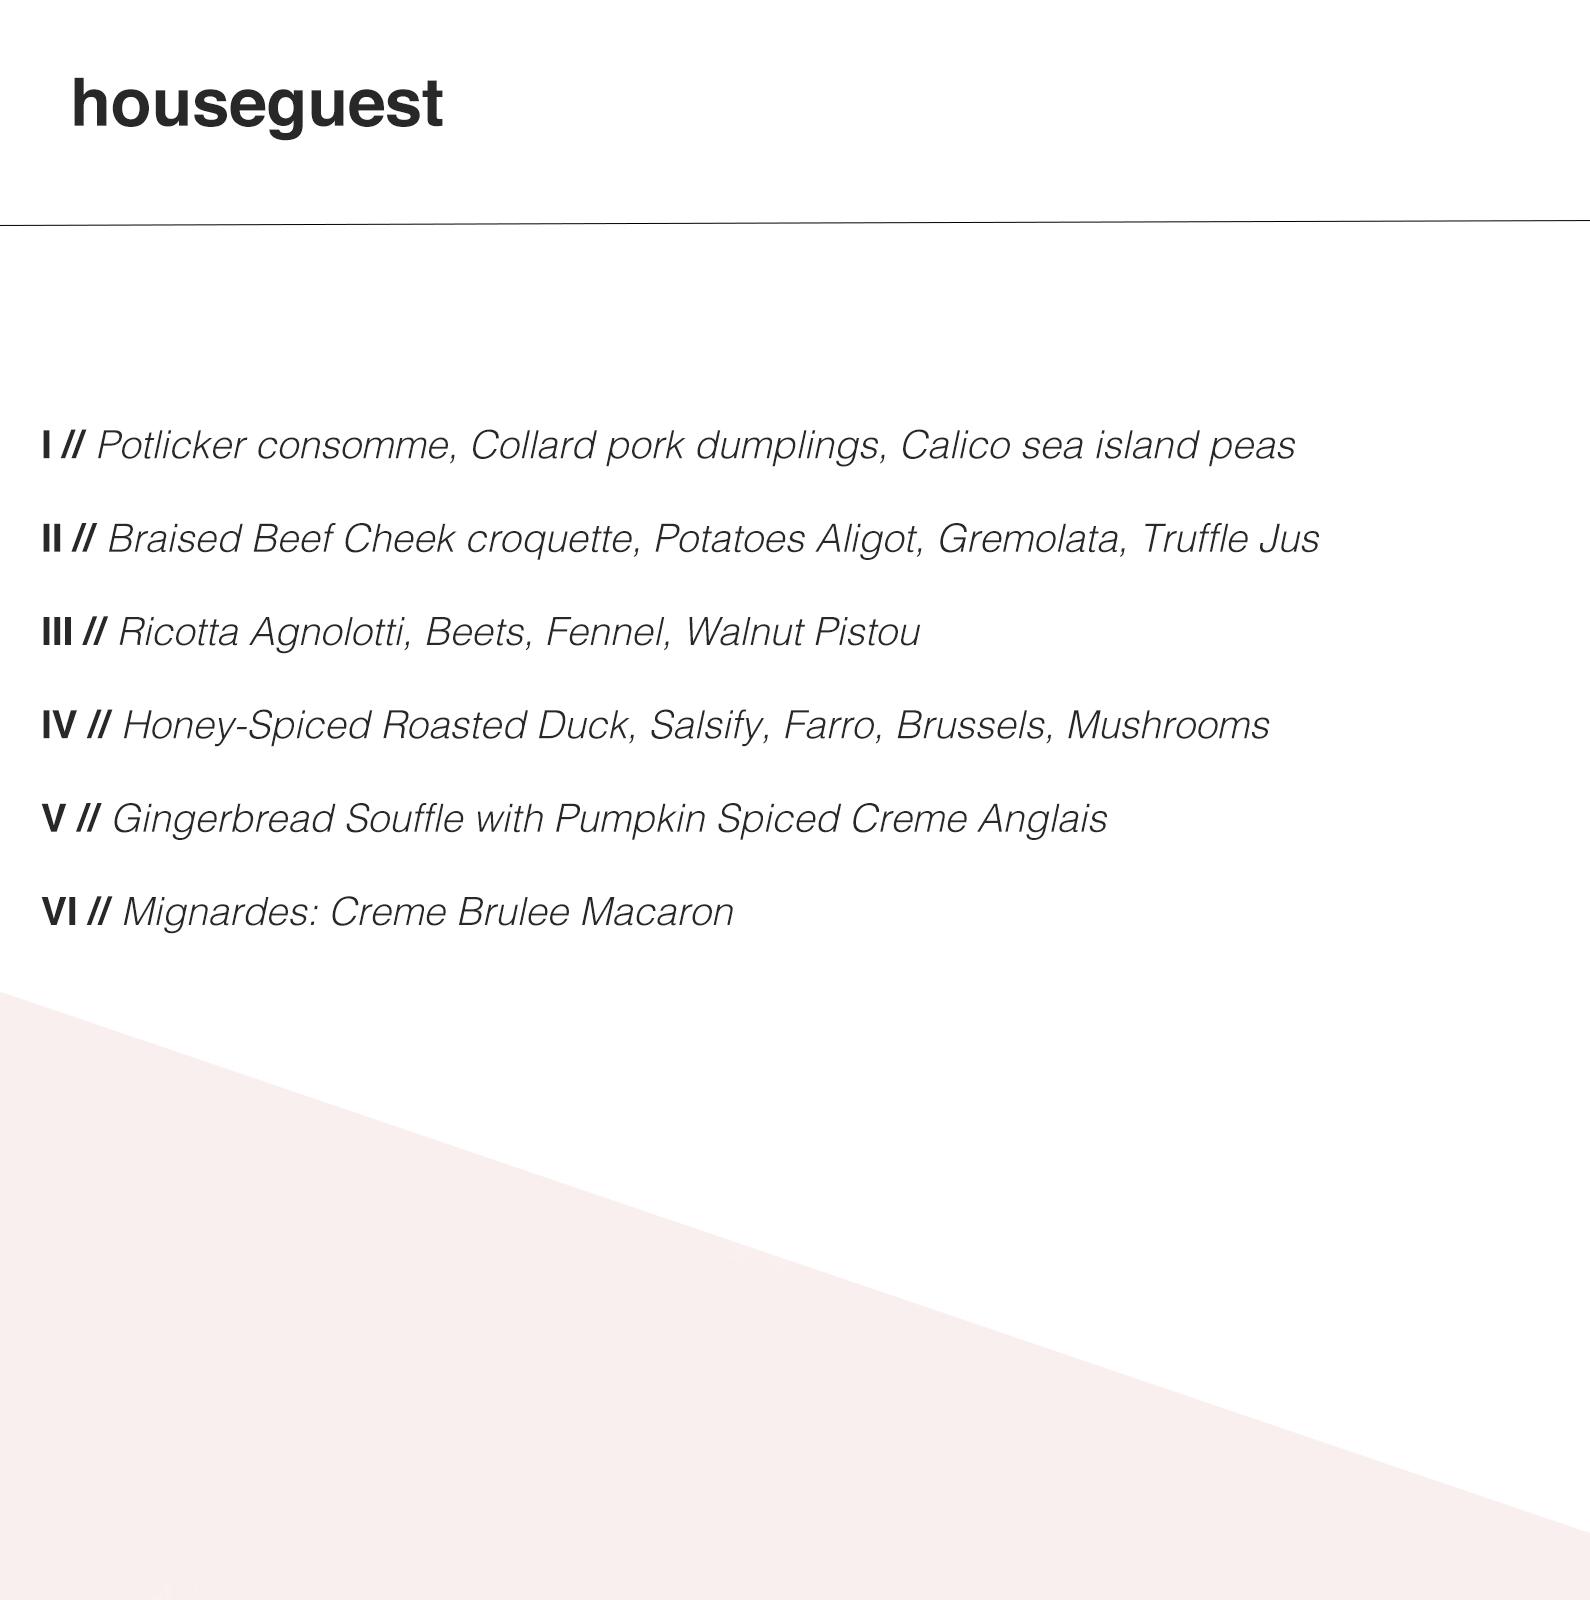 houseguestmenu option2.jpg